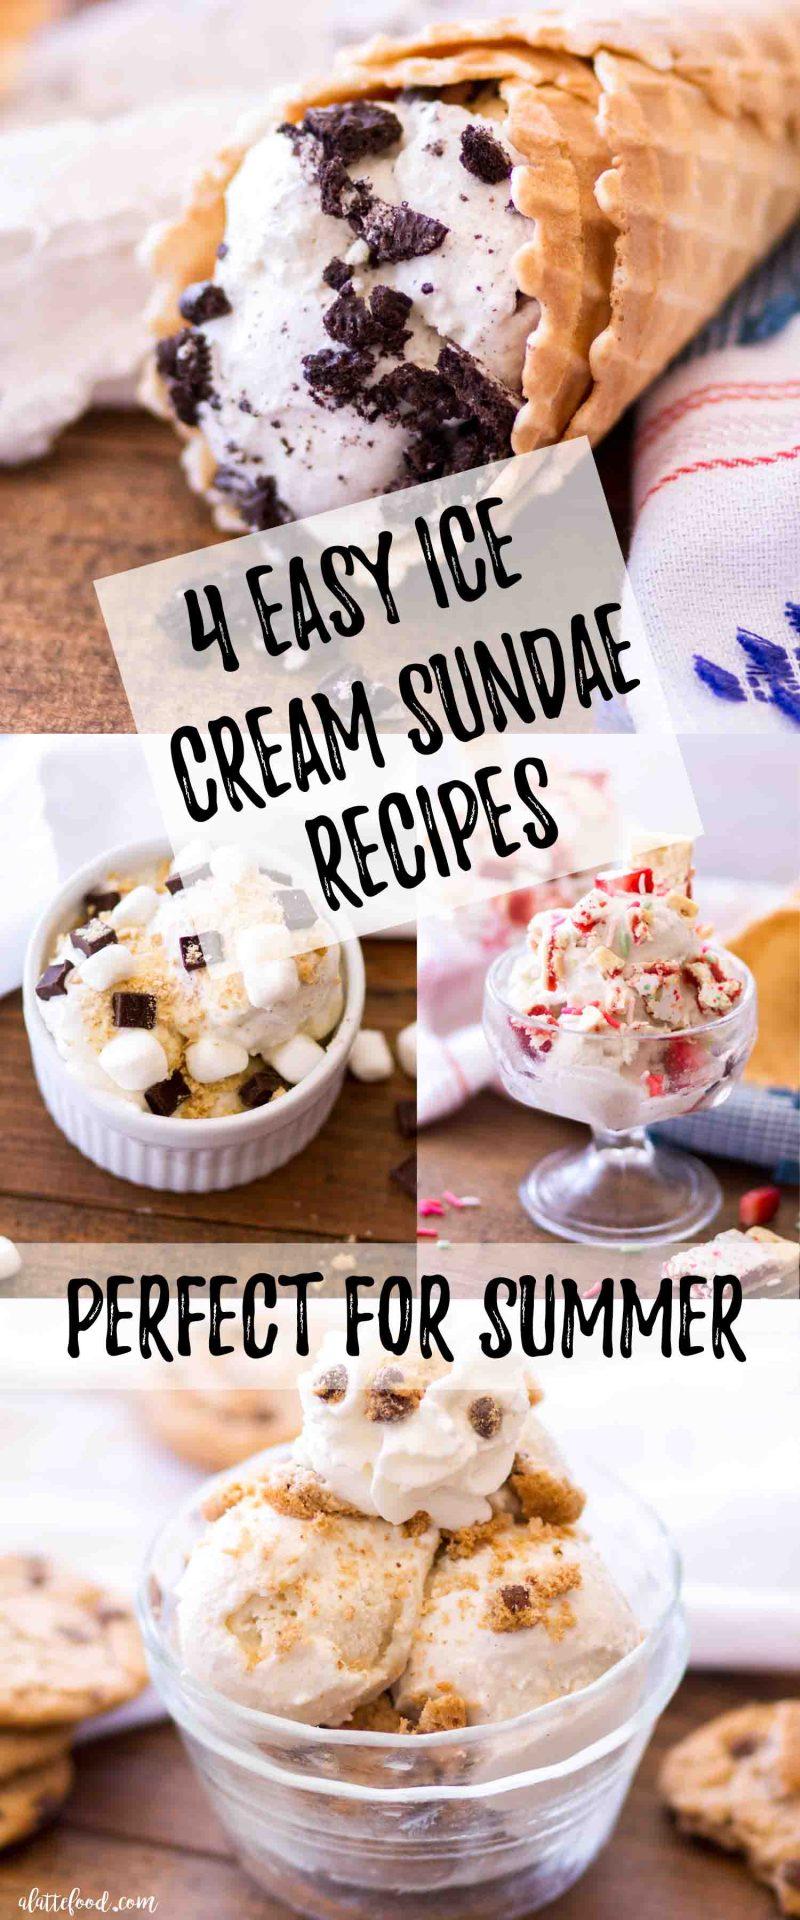 four easy ice cream sundae recipes perfect for summer